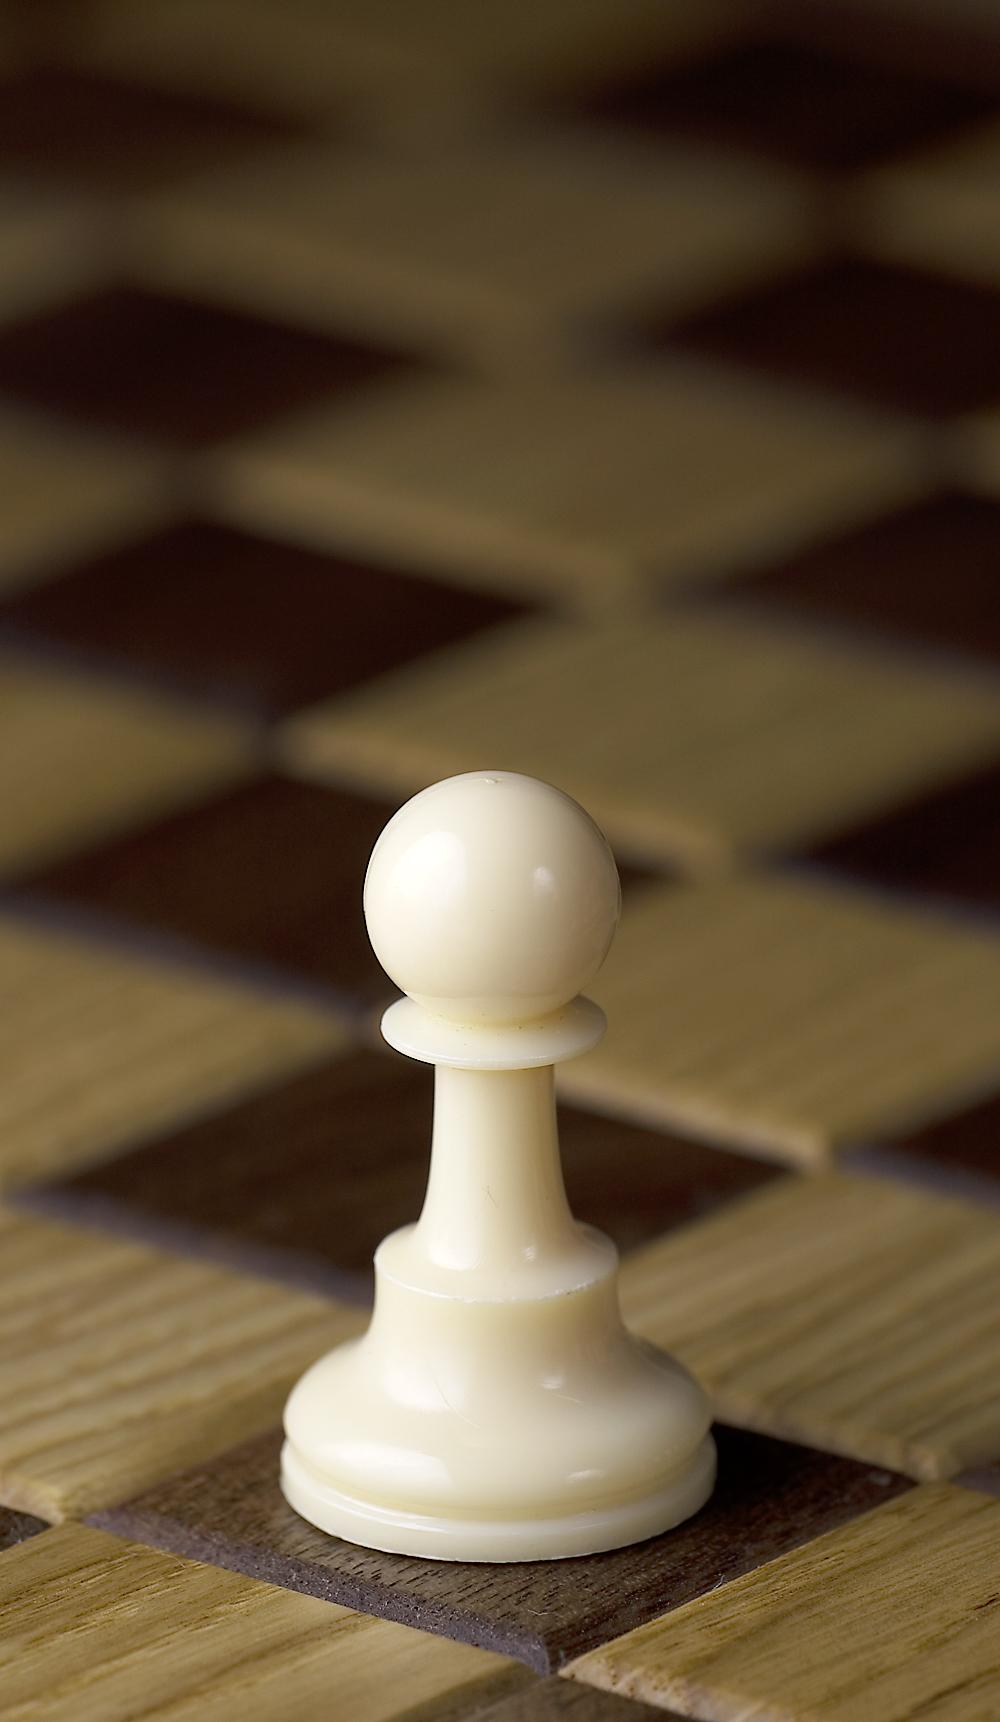 5_Books_On_Pawns_Structure_(Morovic,_Baburin, Soltis & Sokolov).RAR Chess_piece_-_White_pawn